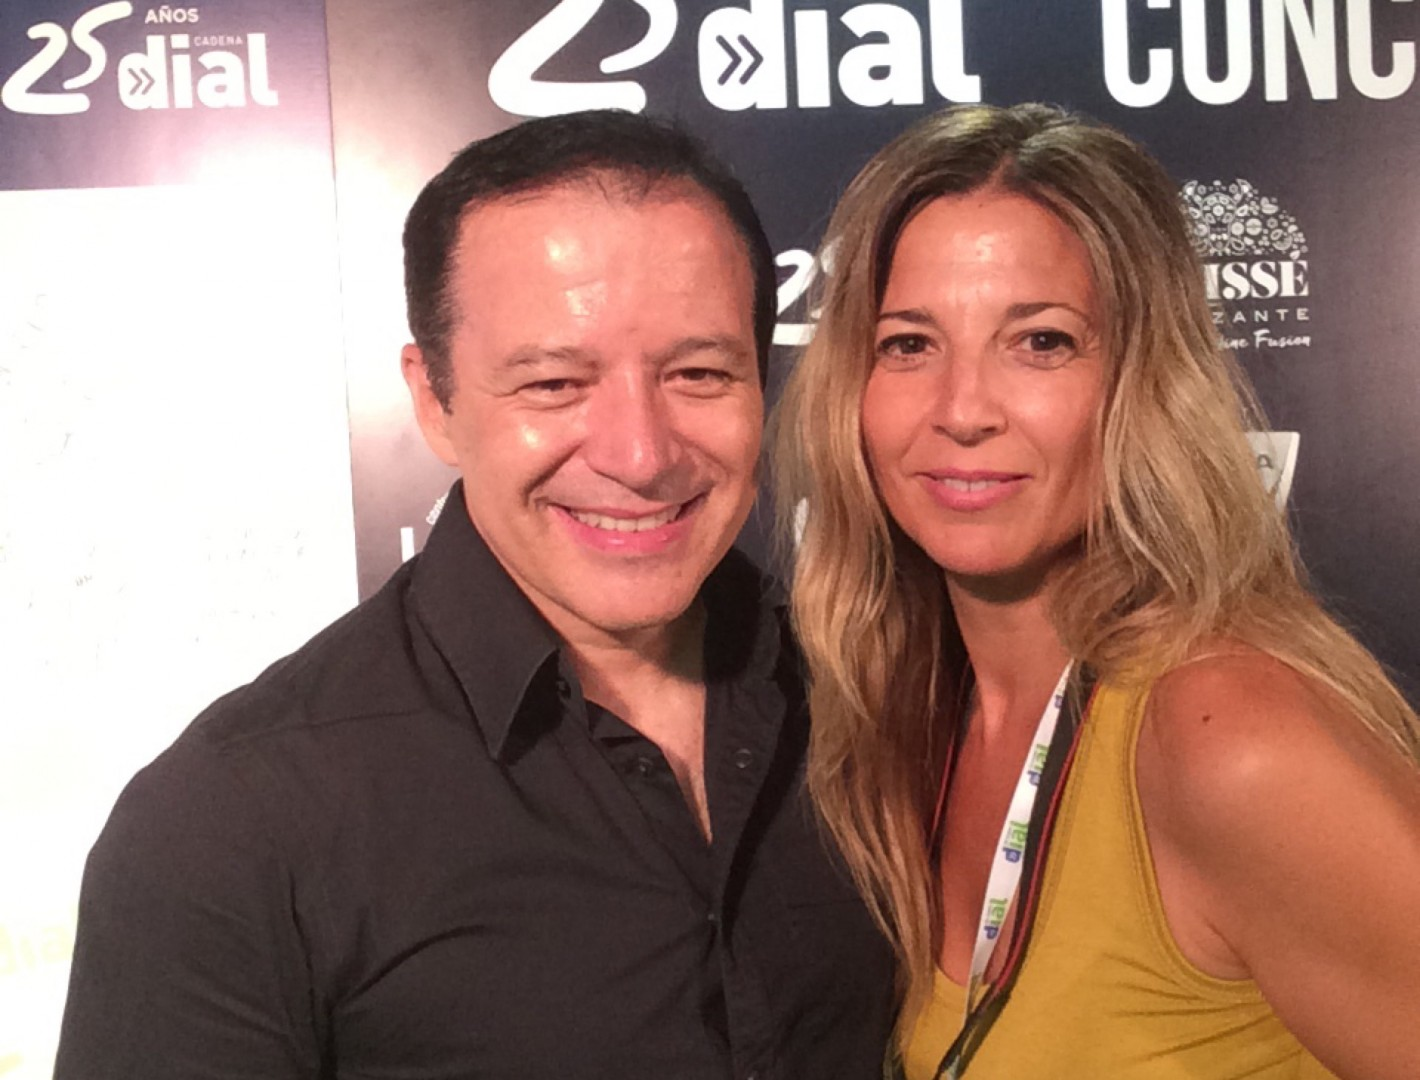 Rafa Cano y Nuria Serena